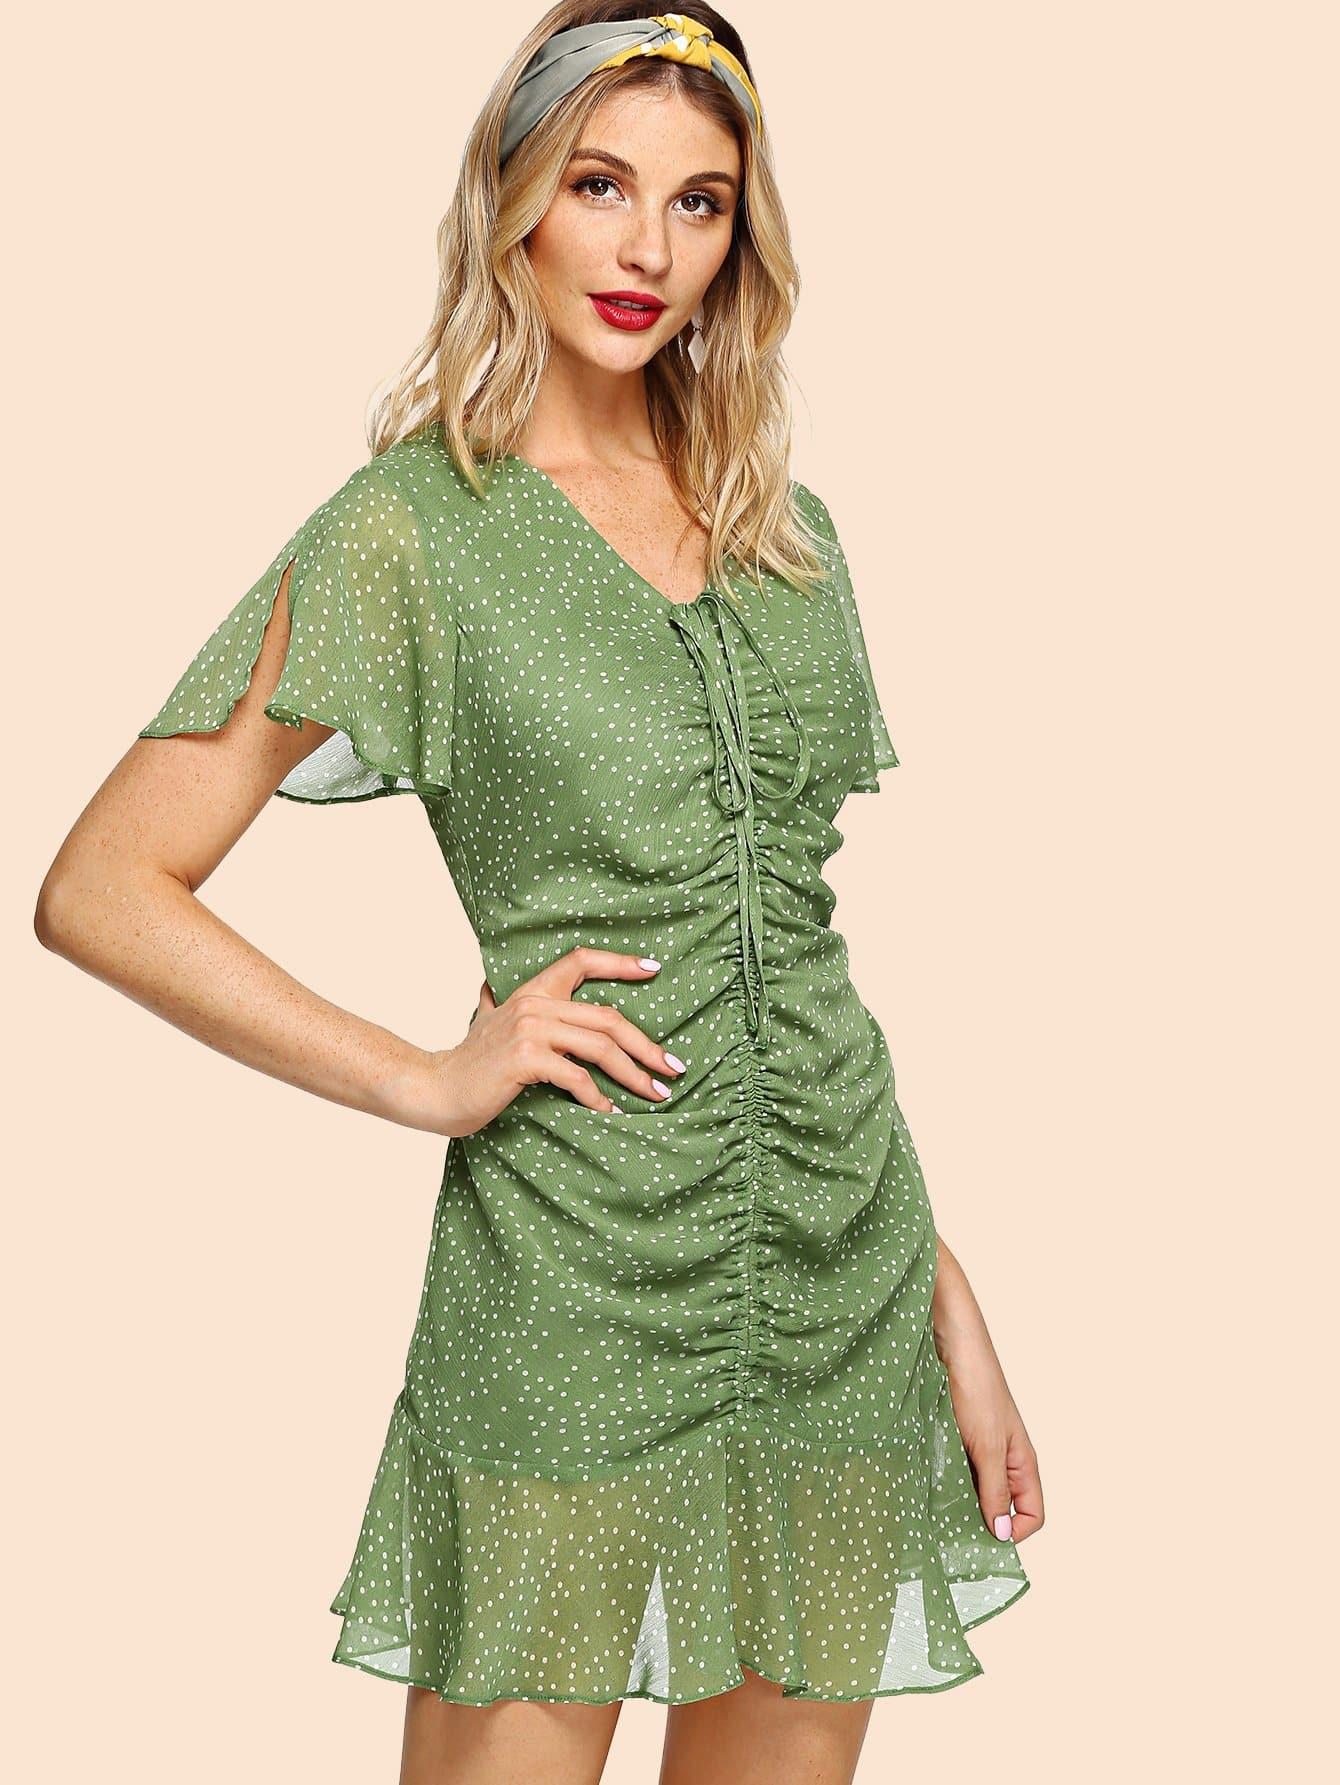 Купить Drawstring Shirred Front Polka Dot Dress, Julie H., SheIn